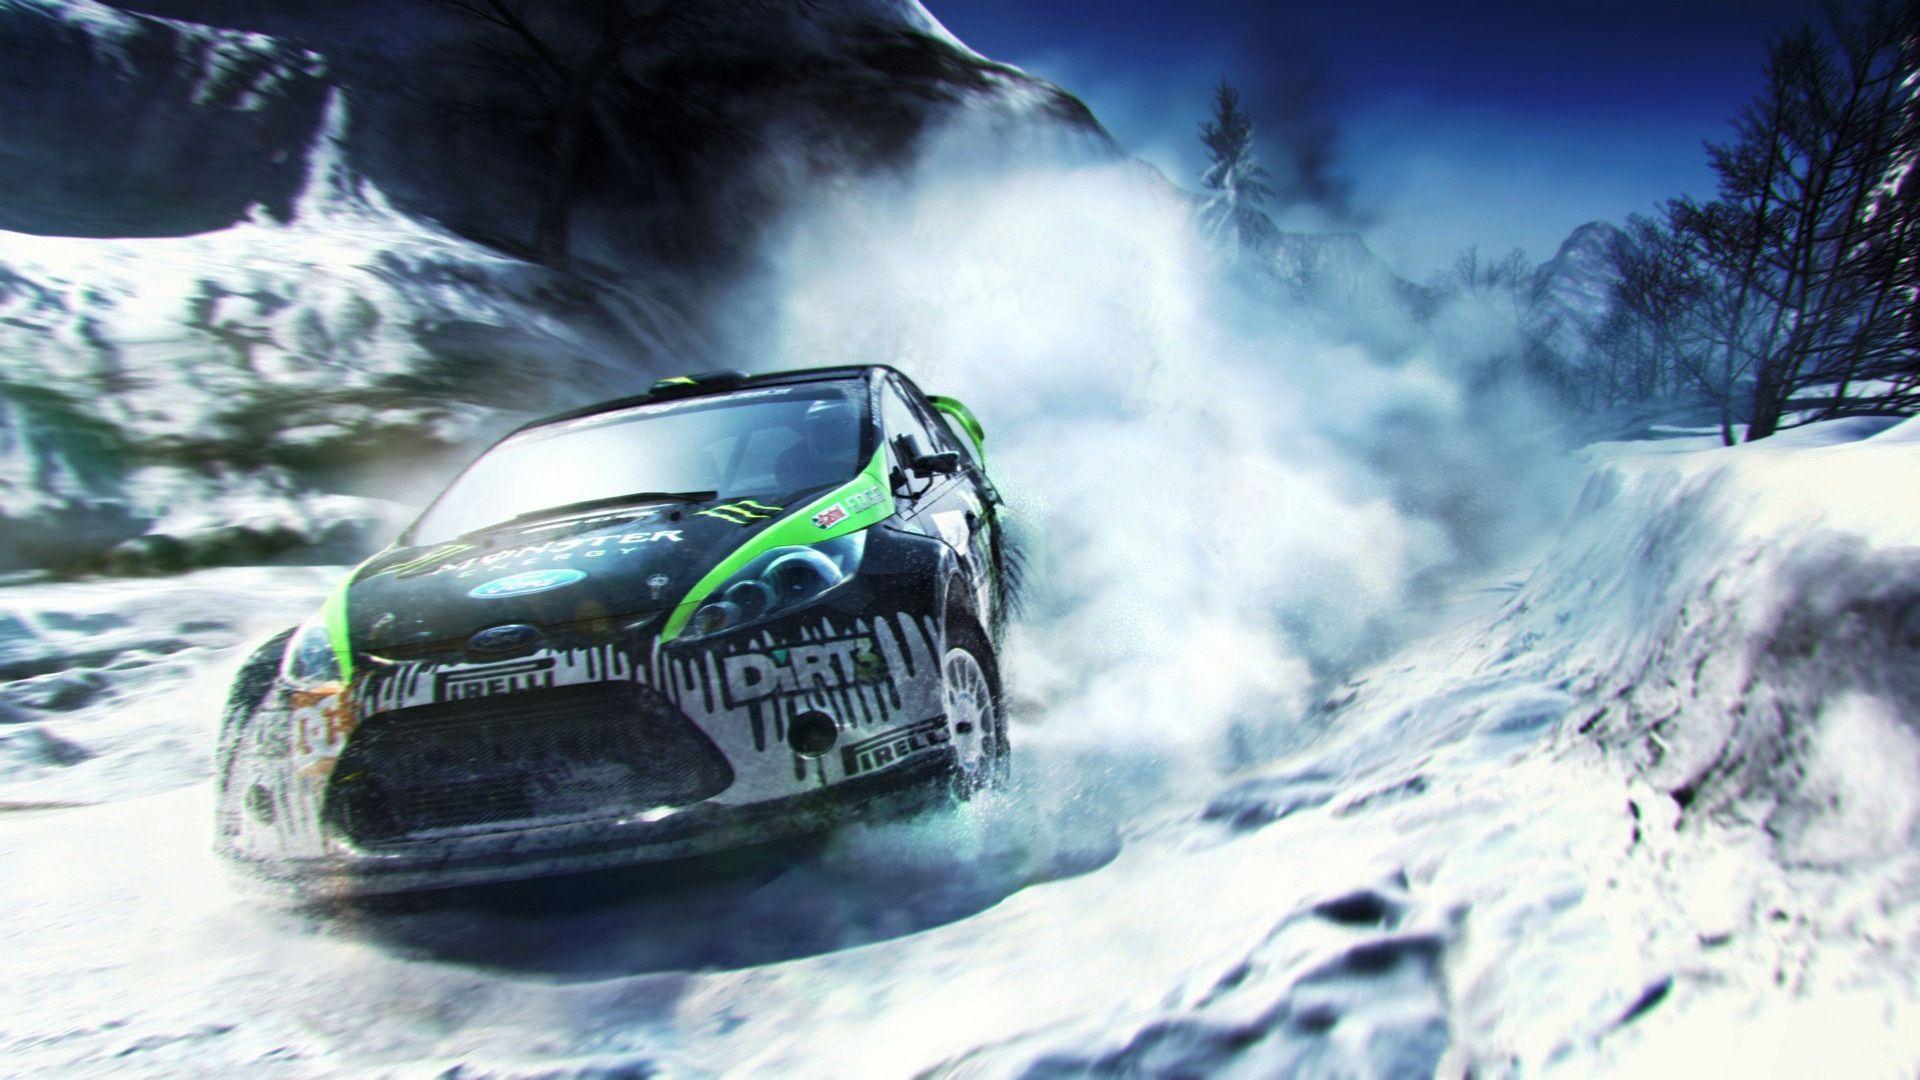 Rally car snow hd hd 1080p wallpapers download eeee - Car racing wallpaper free download ...